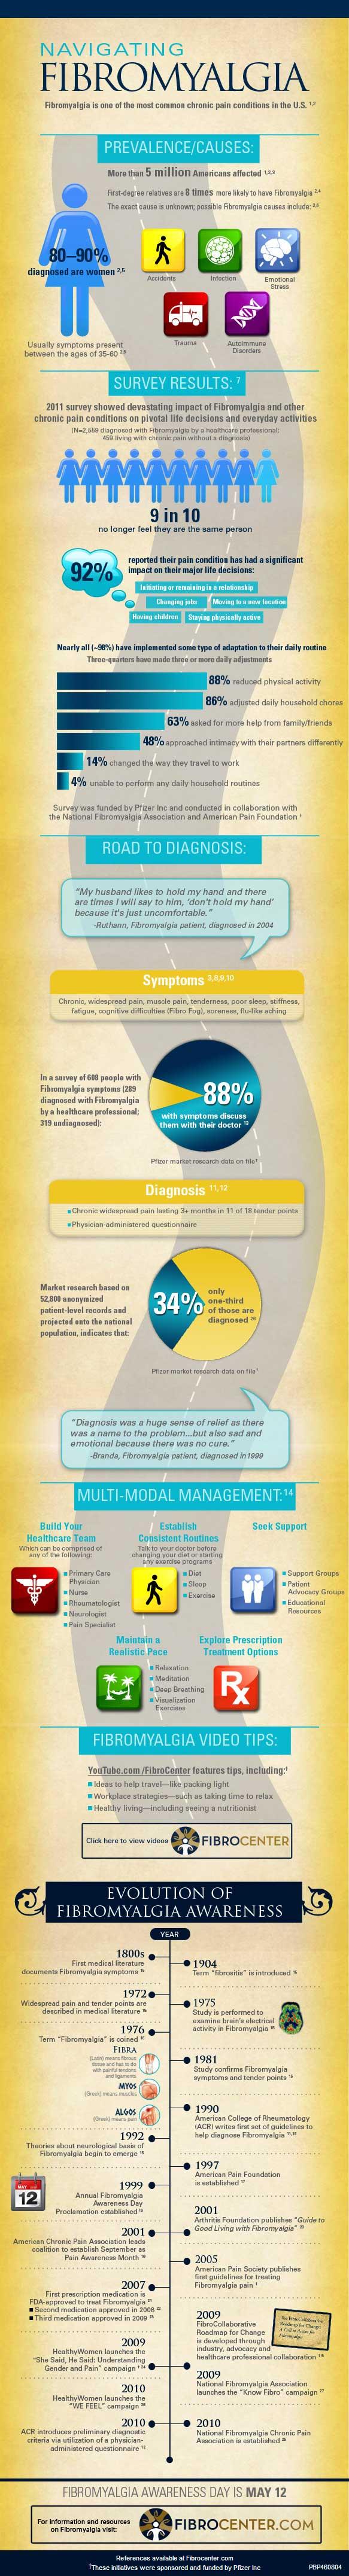 Image: Navigating Fibromyalgia